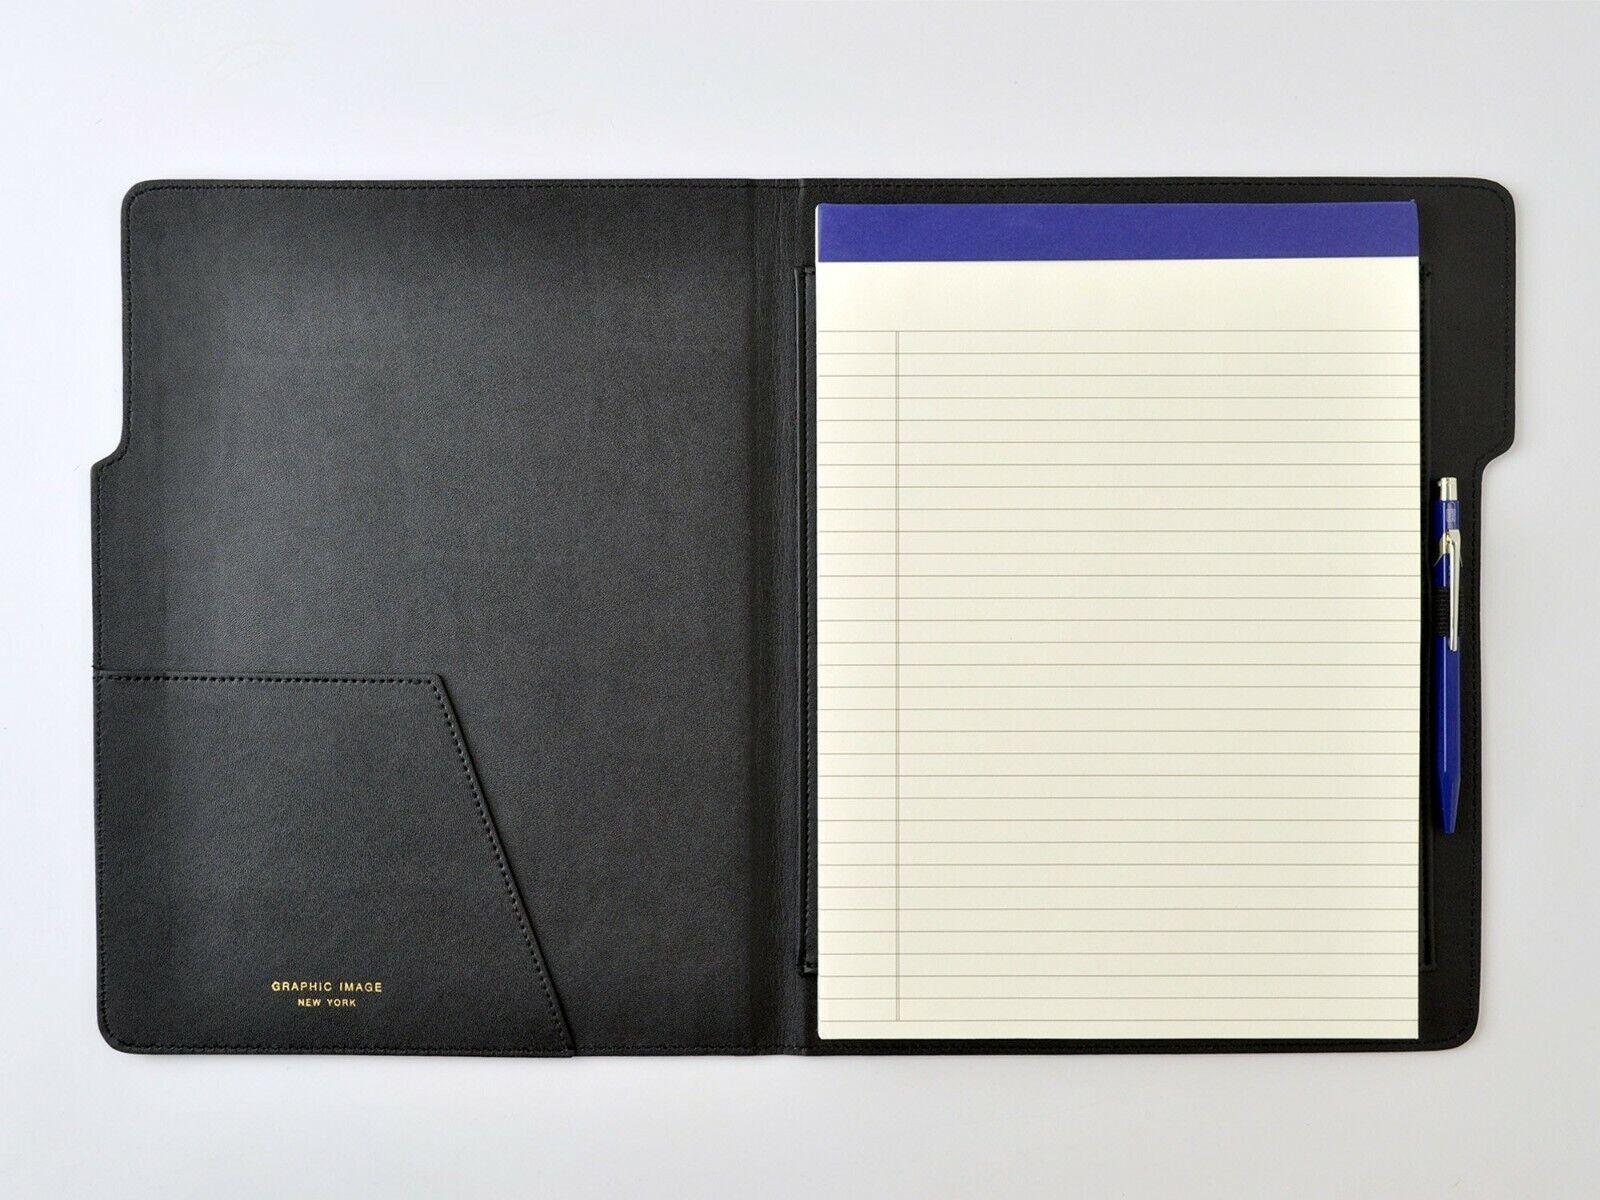 "New Leather Portfolio 9x12"" Graphic Image Hugo Embossed Ring"